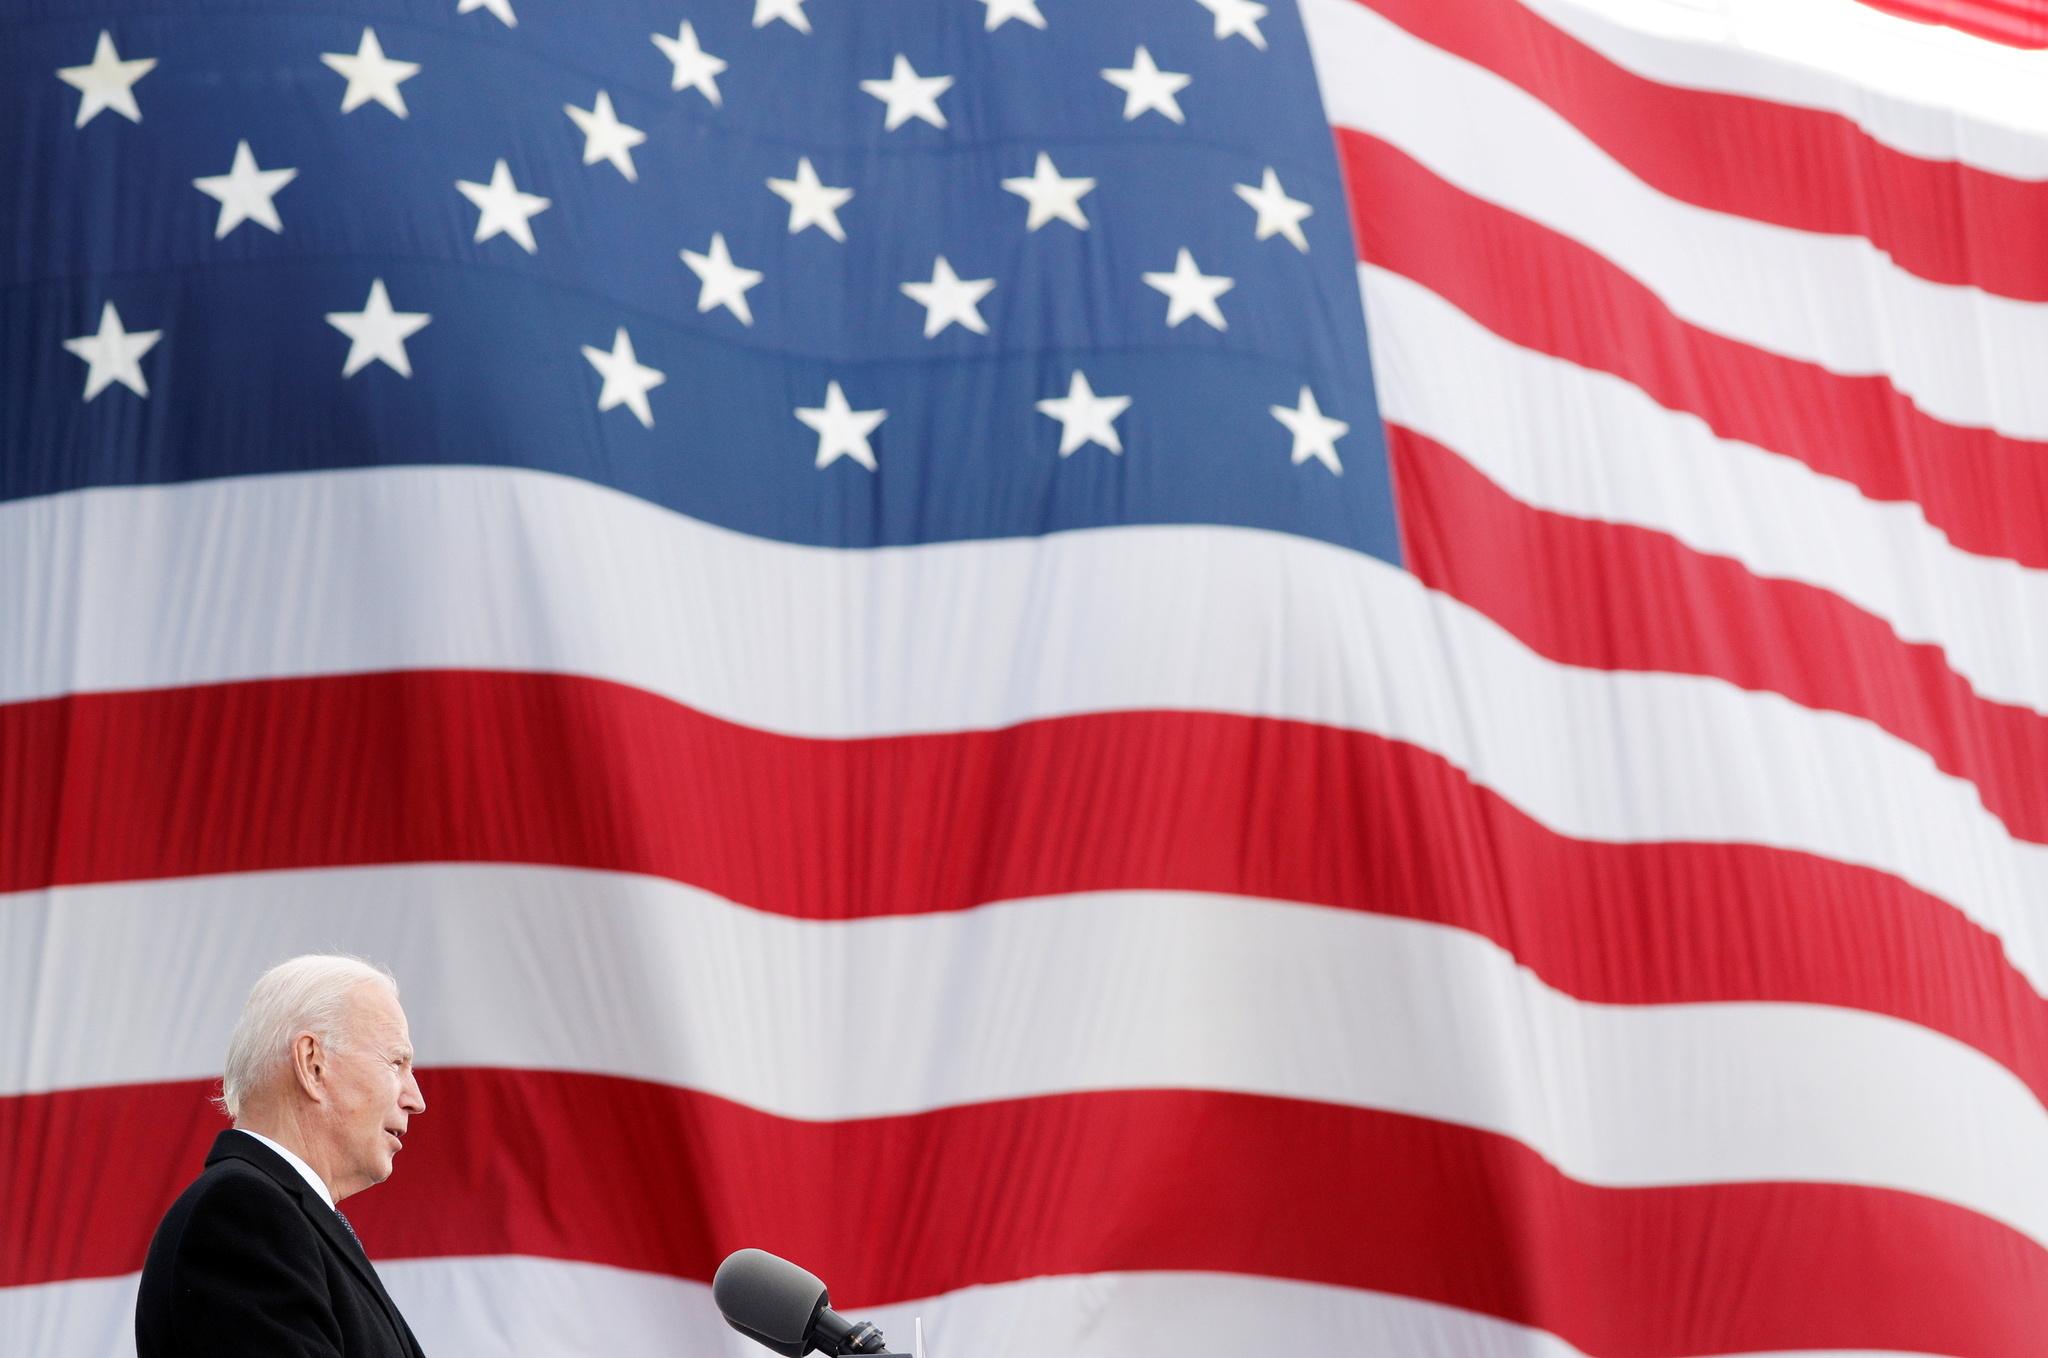 Latest from Joe Biden and Kamala Harris' inauguration day: Live updates